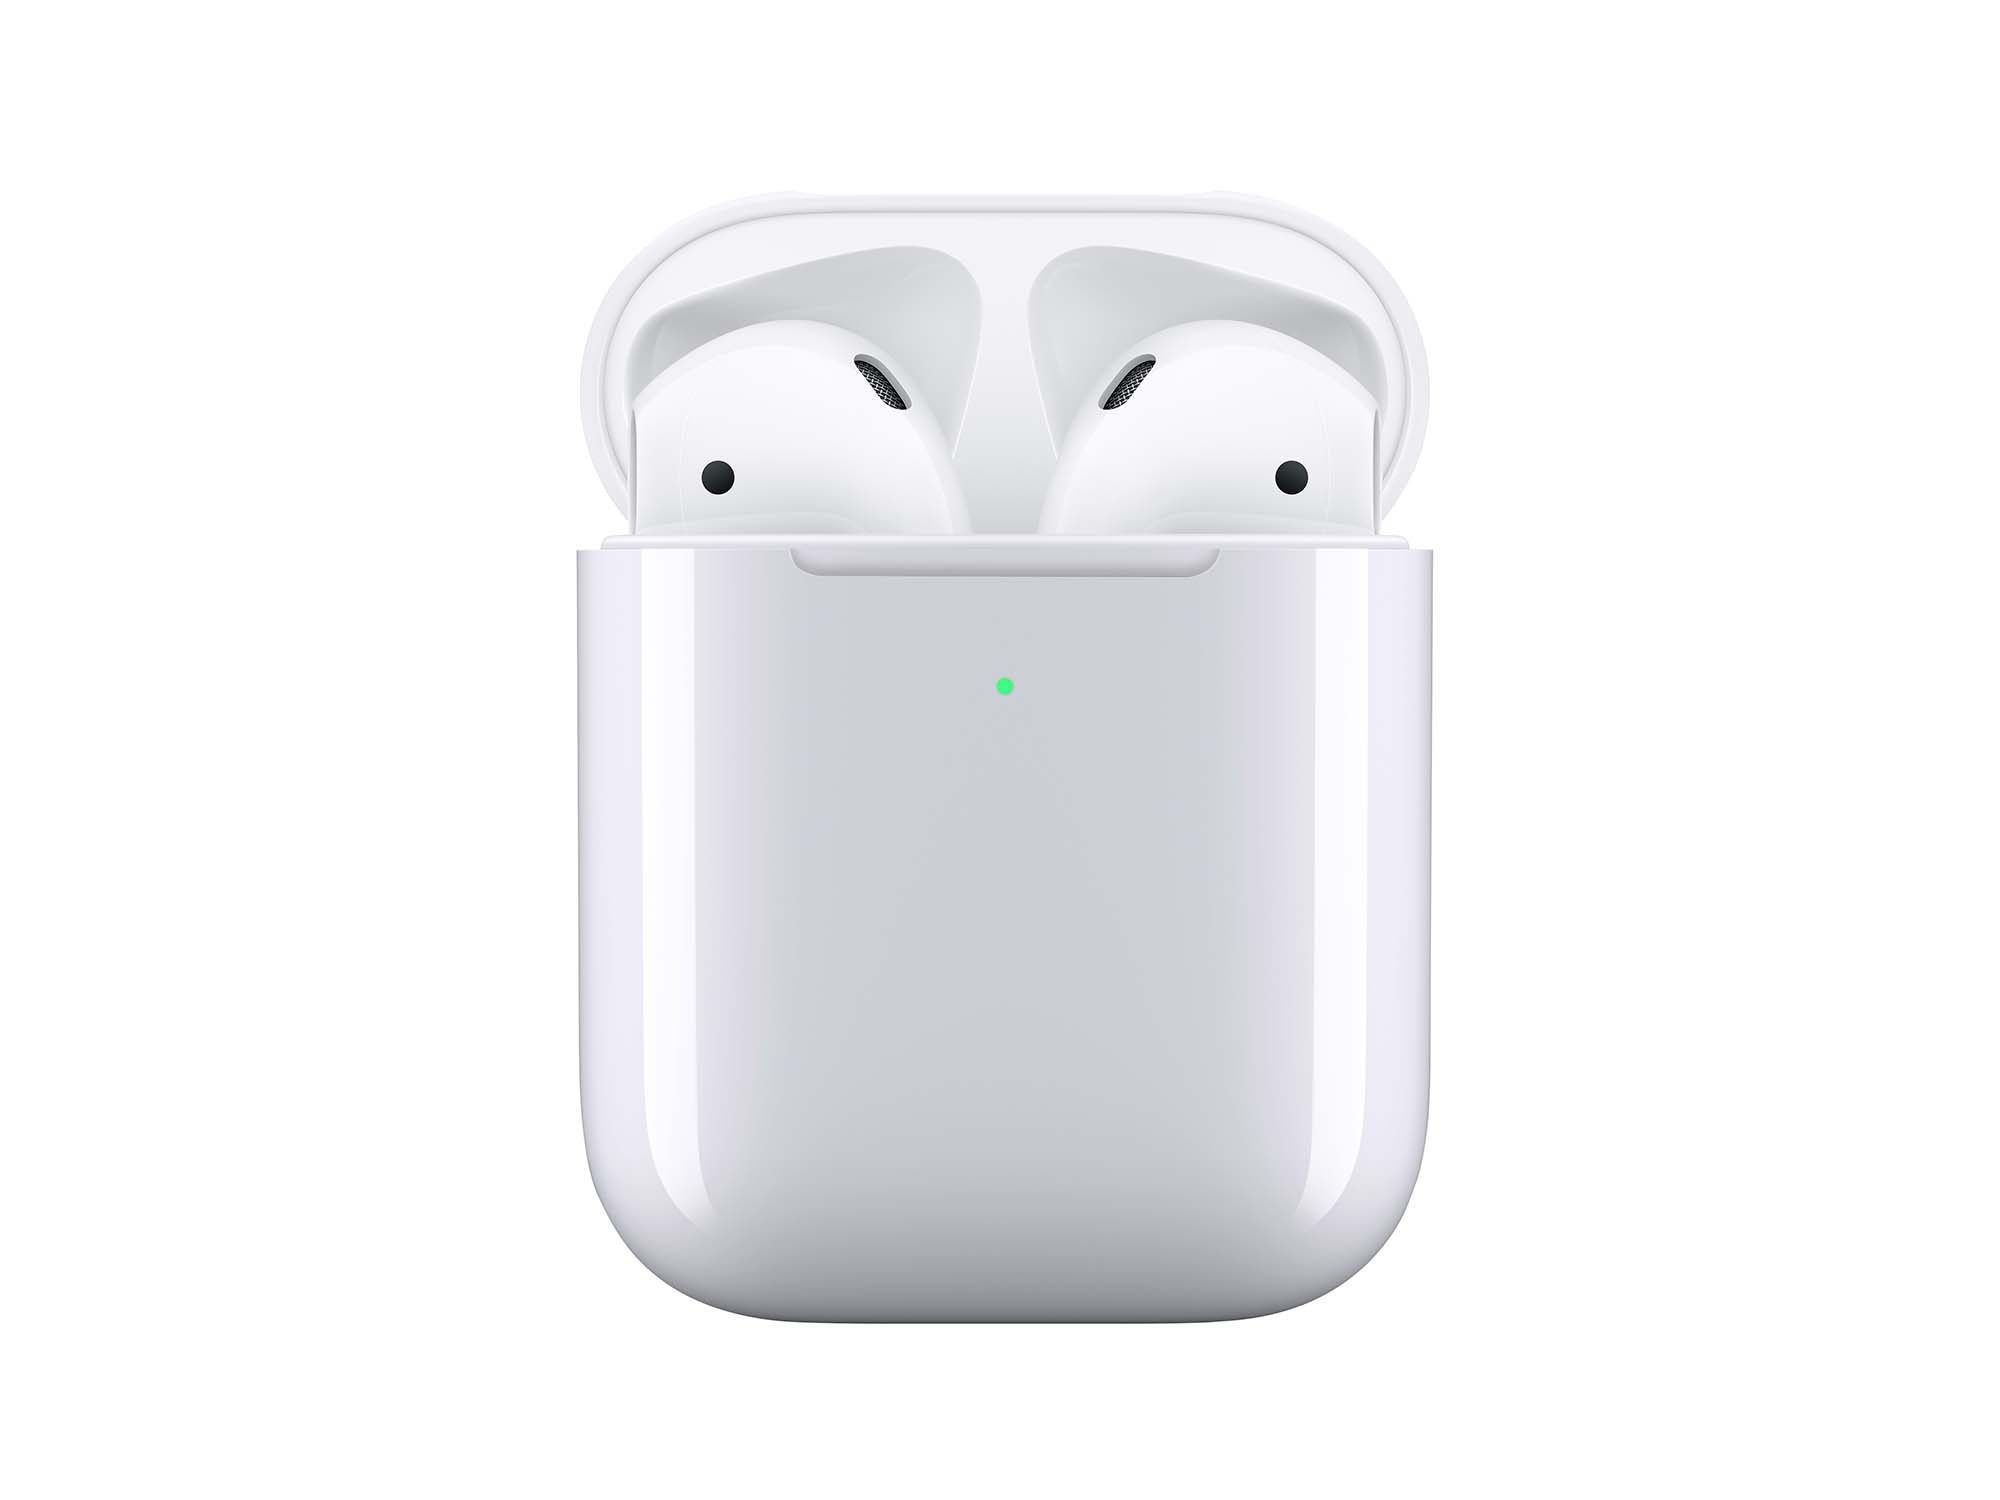 Free Apple Airpods 2 Mockup Apple Airpods 2 Apple Mockup